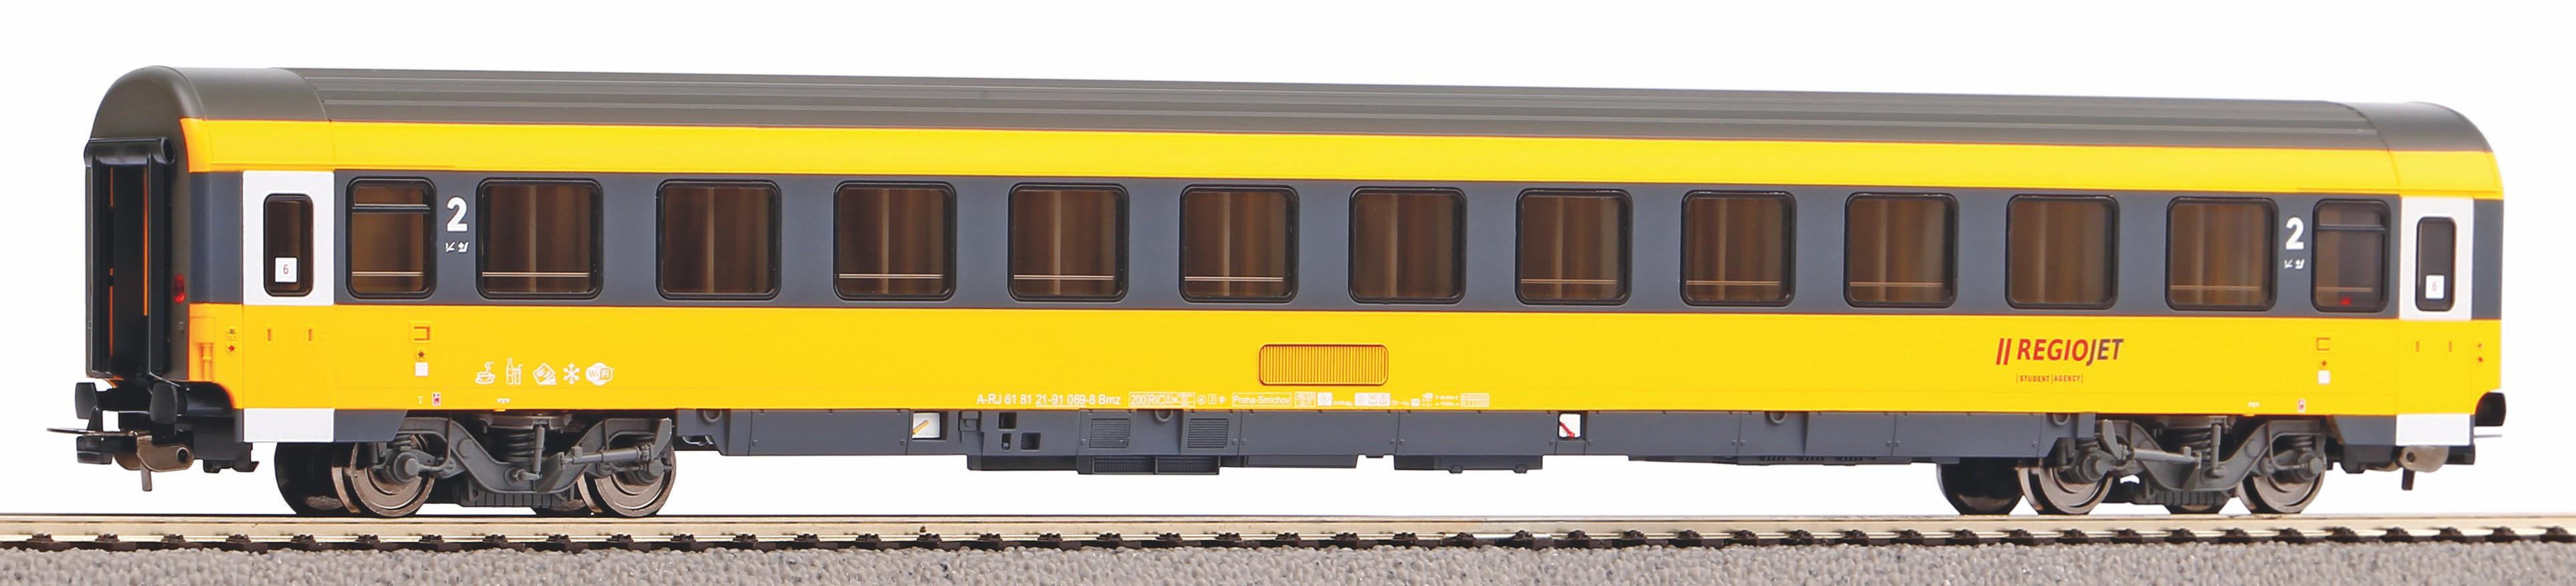 Piko Osobní vagón Eurofima 2. tř. Regiojet VI - 58536